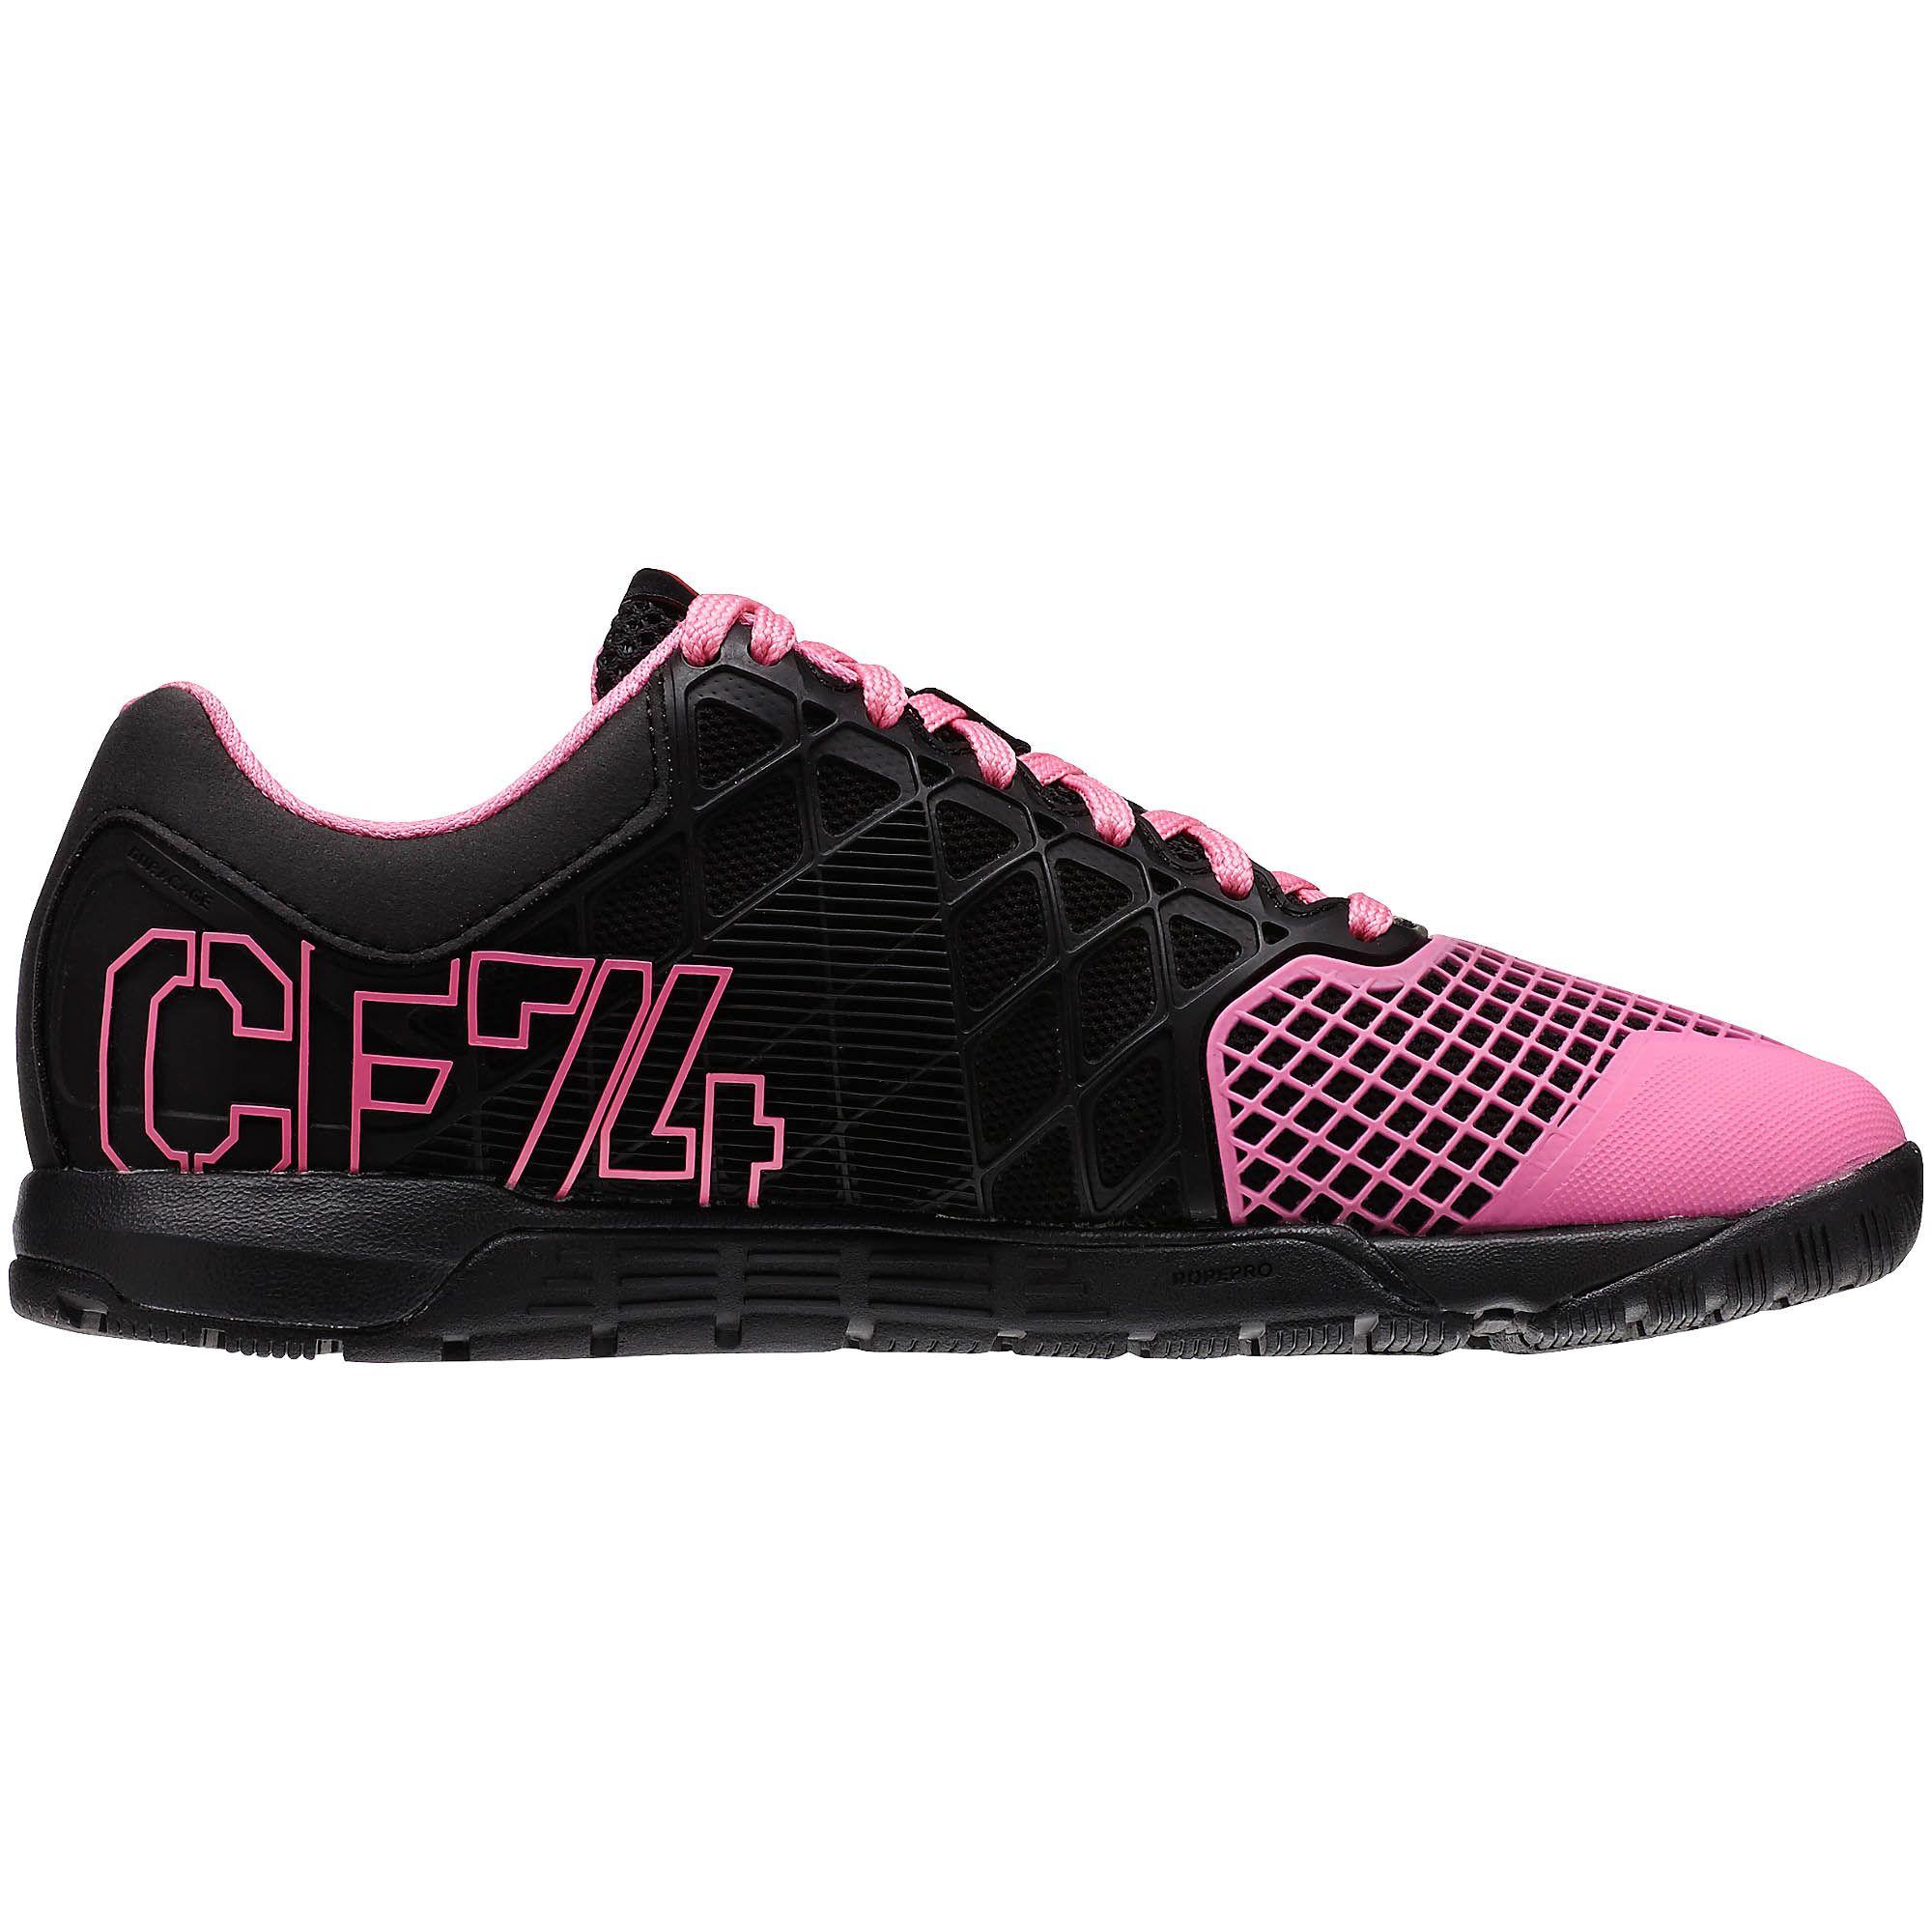 timeless design ccd45 a0e8e CrossFit-Nano-4.0-zwart-roze-zijaanzicht-binnenkant-2000x2000.jpg